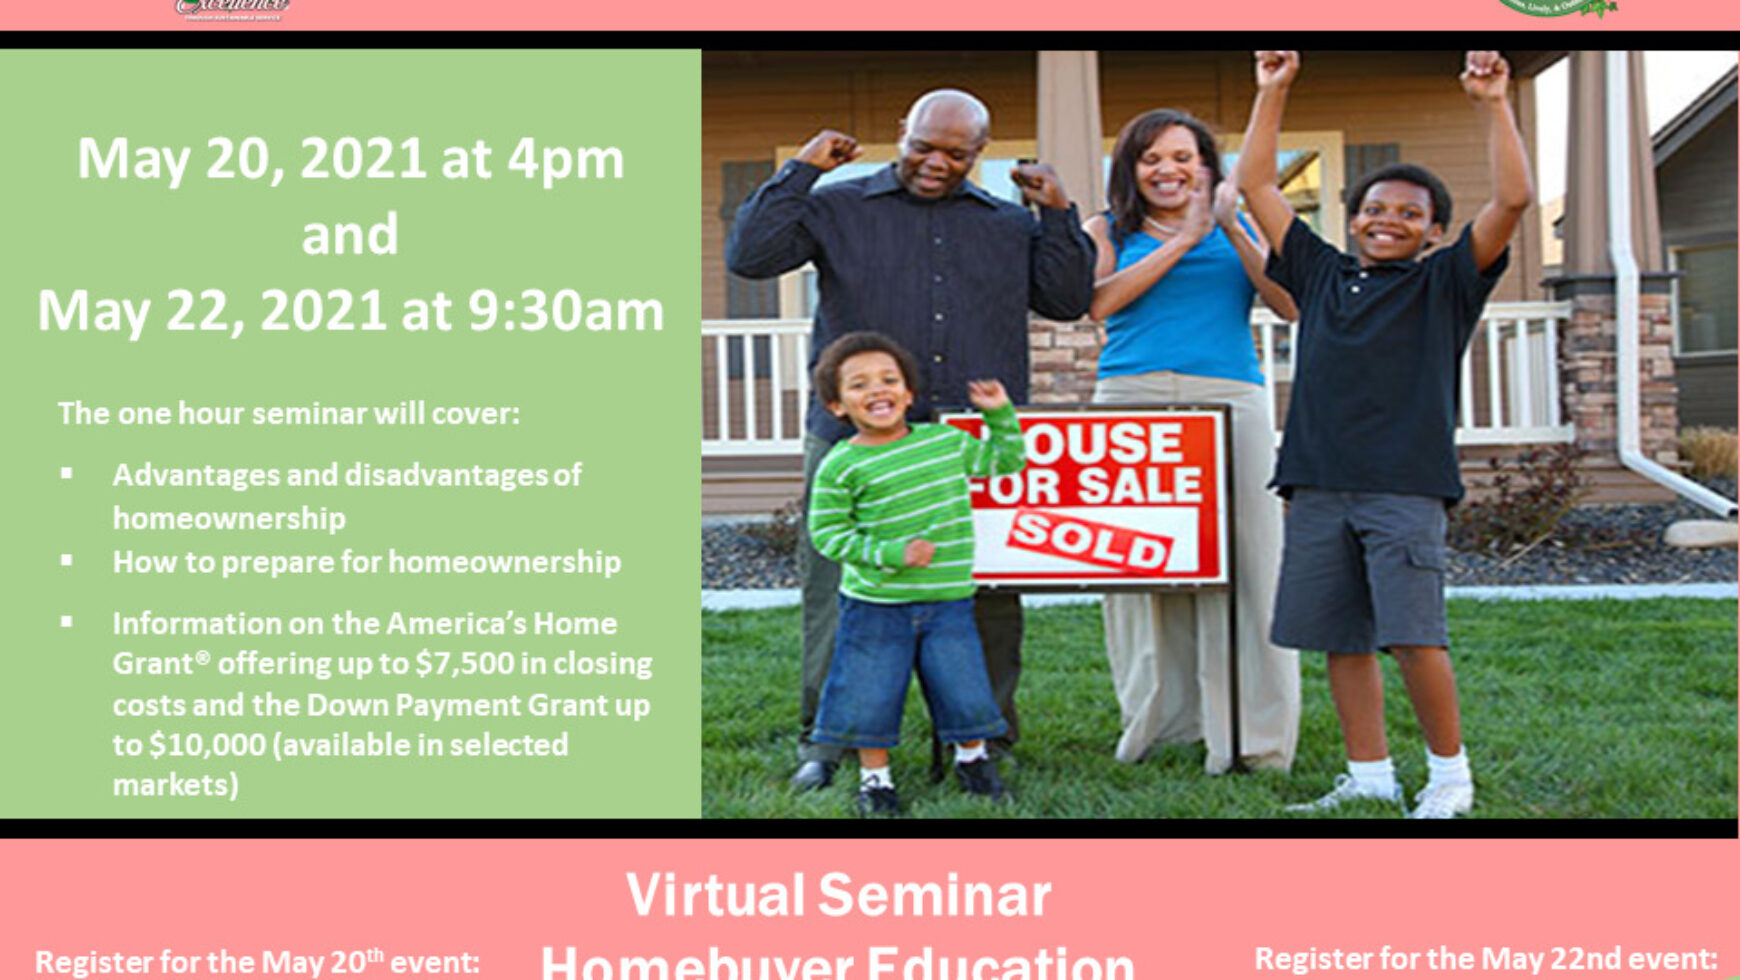 MLO Hosts Homebuying Seminar